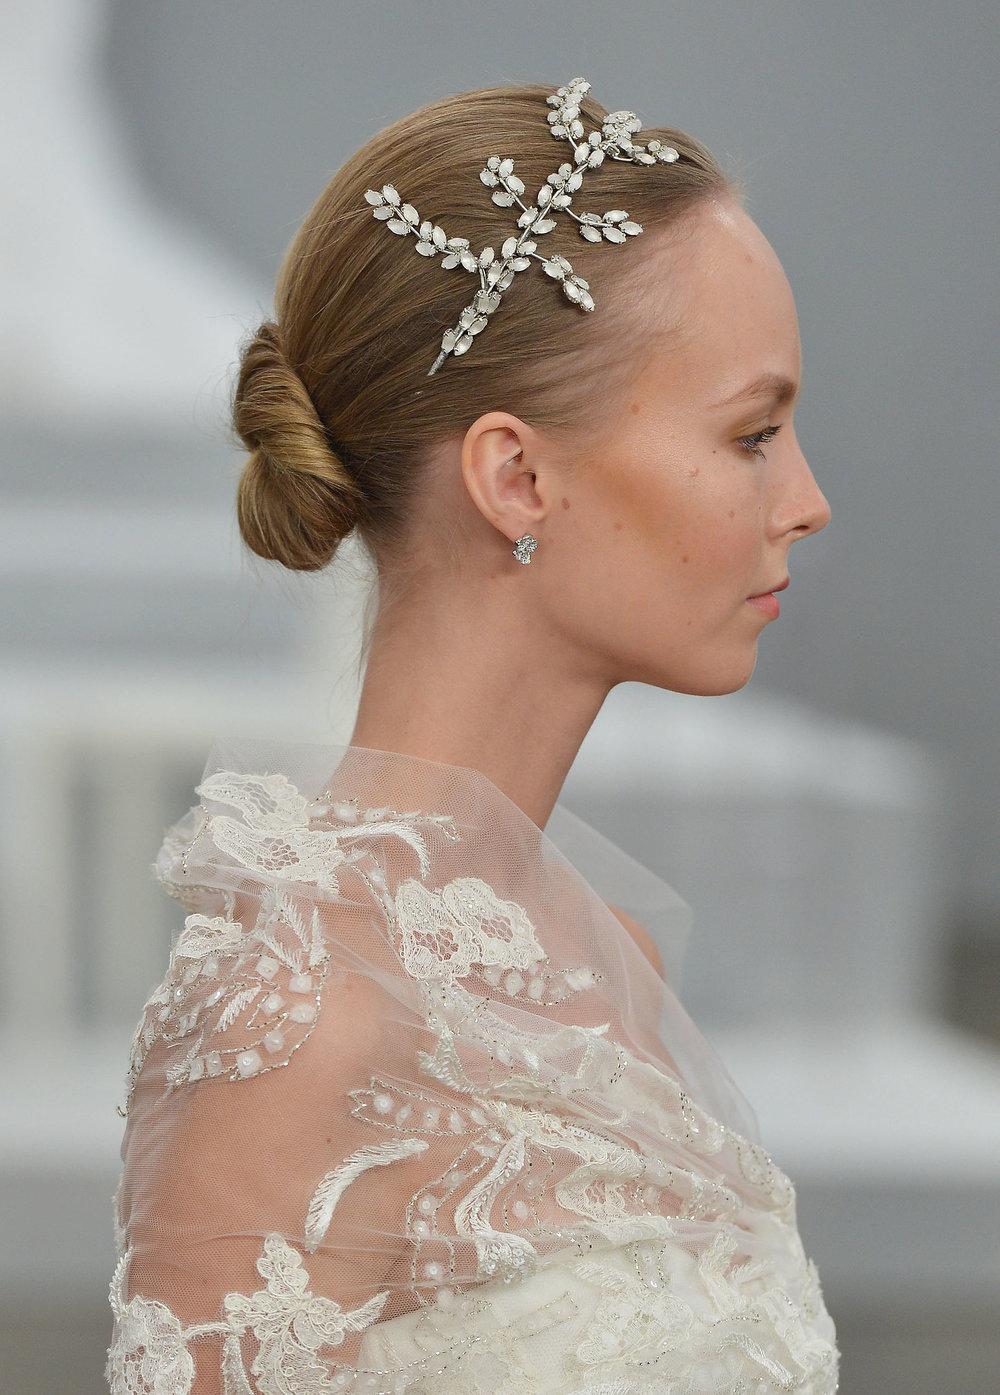 Monique-Lhuillier-Bridal-Spring-2015.jpg